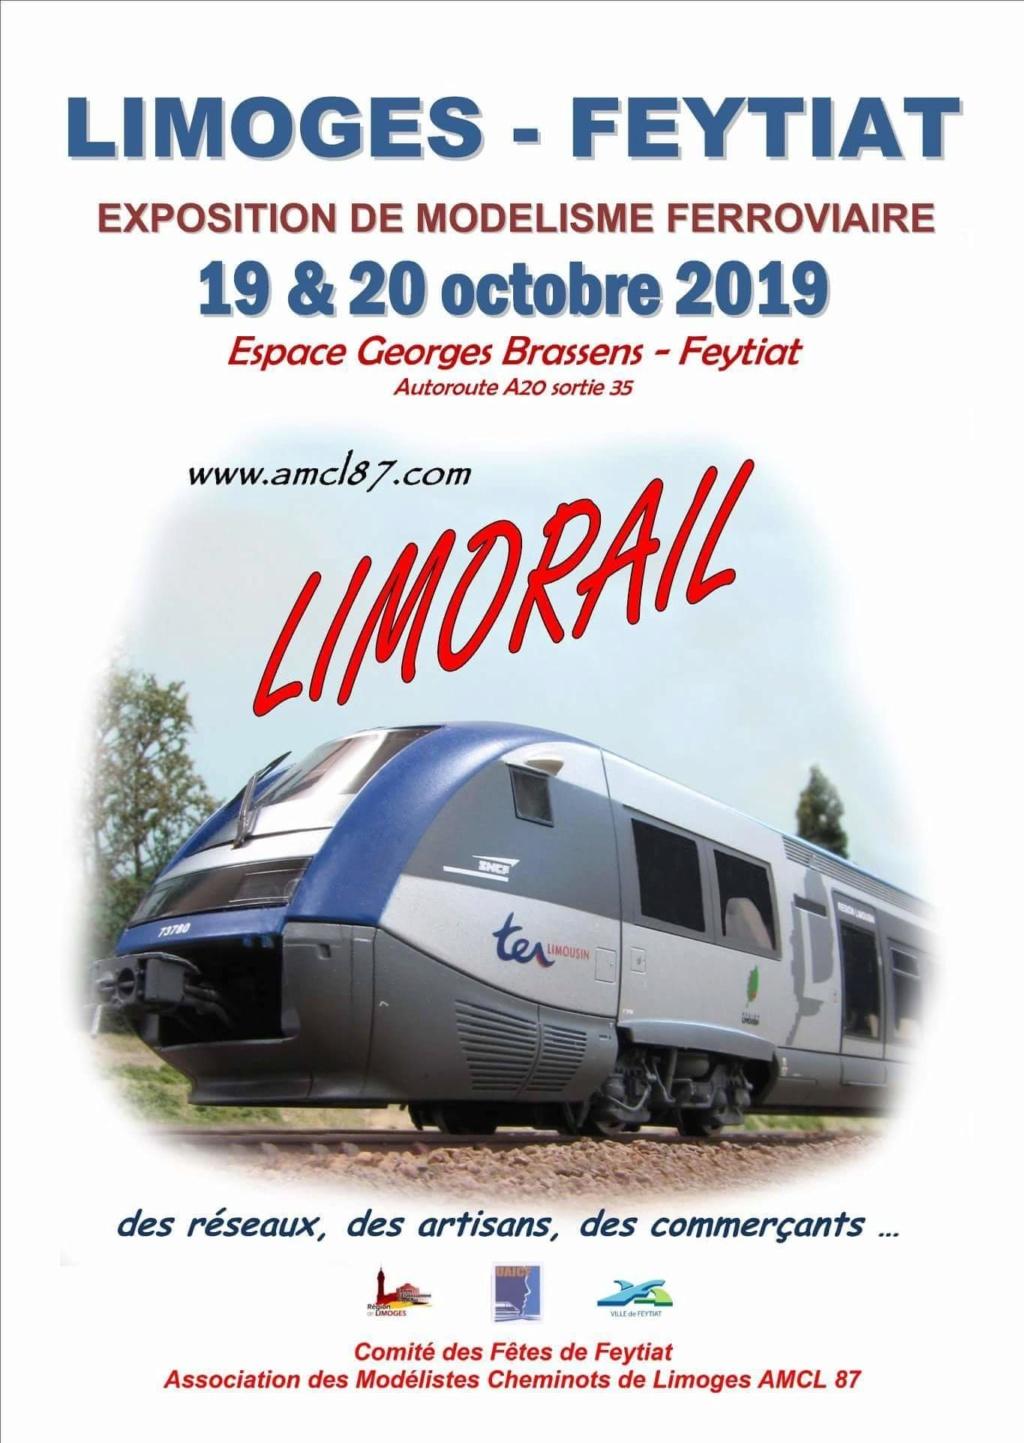 Calendrier Expo Maquette 2019.Agenda 2019 Maquette Modelisme Expositions Forums